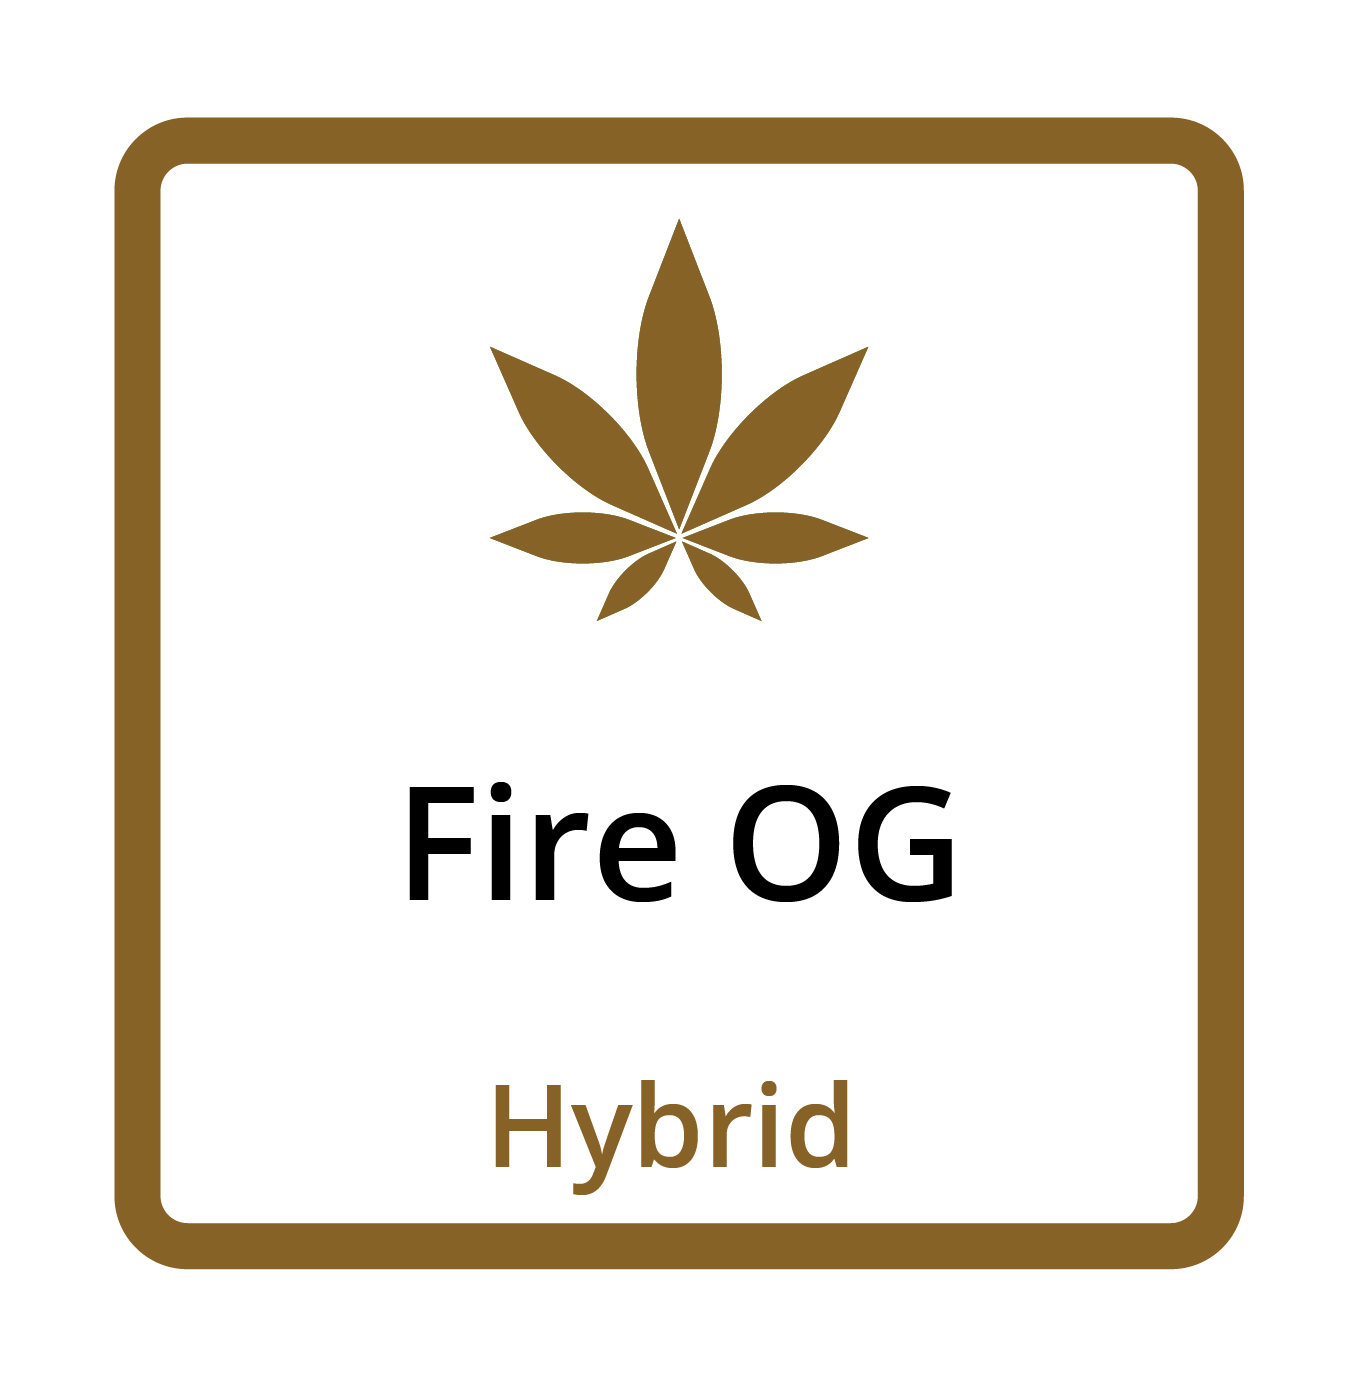 FireOG (Hybrid)